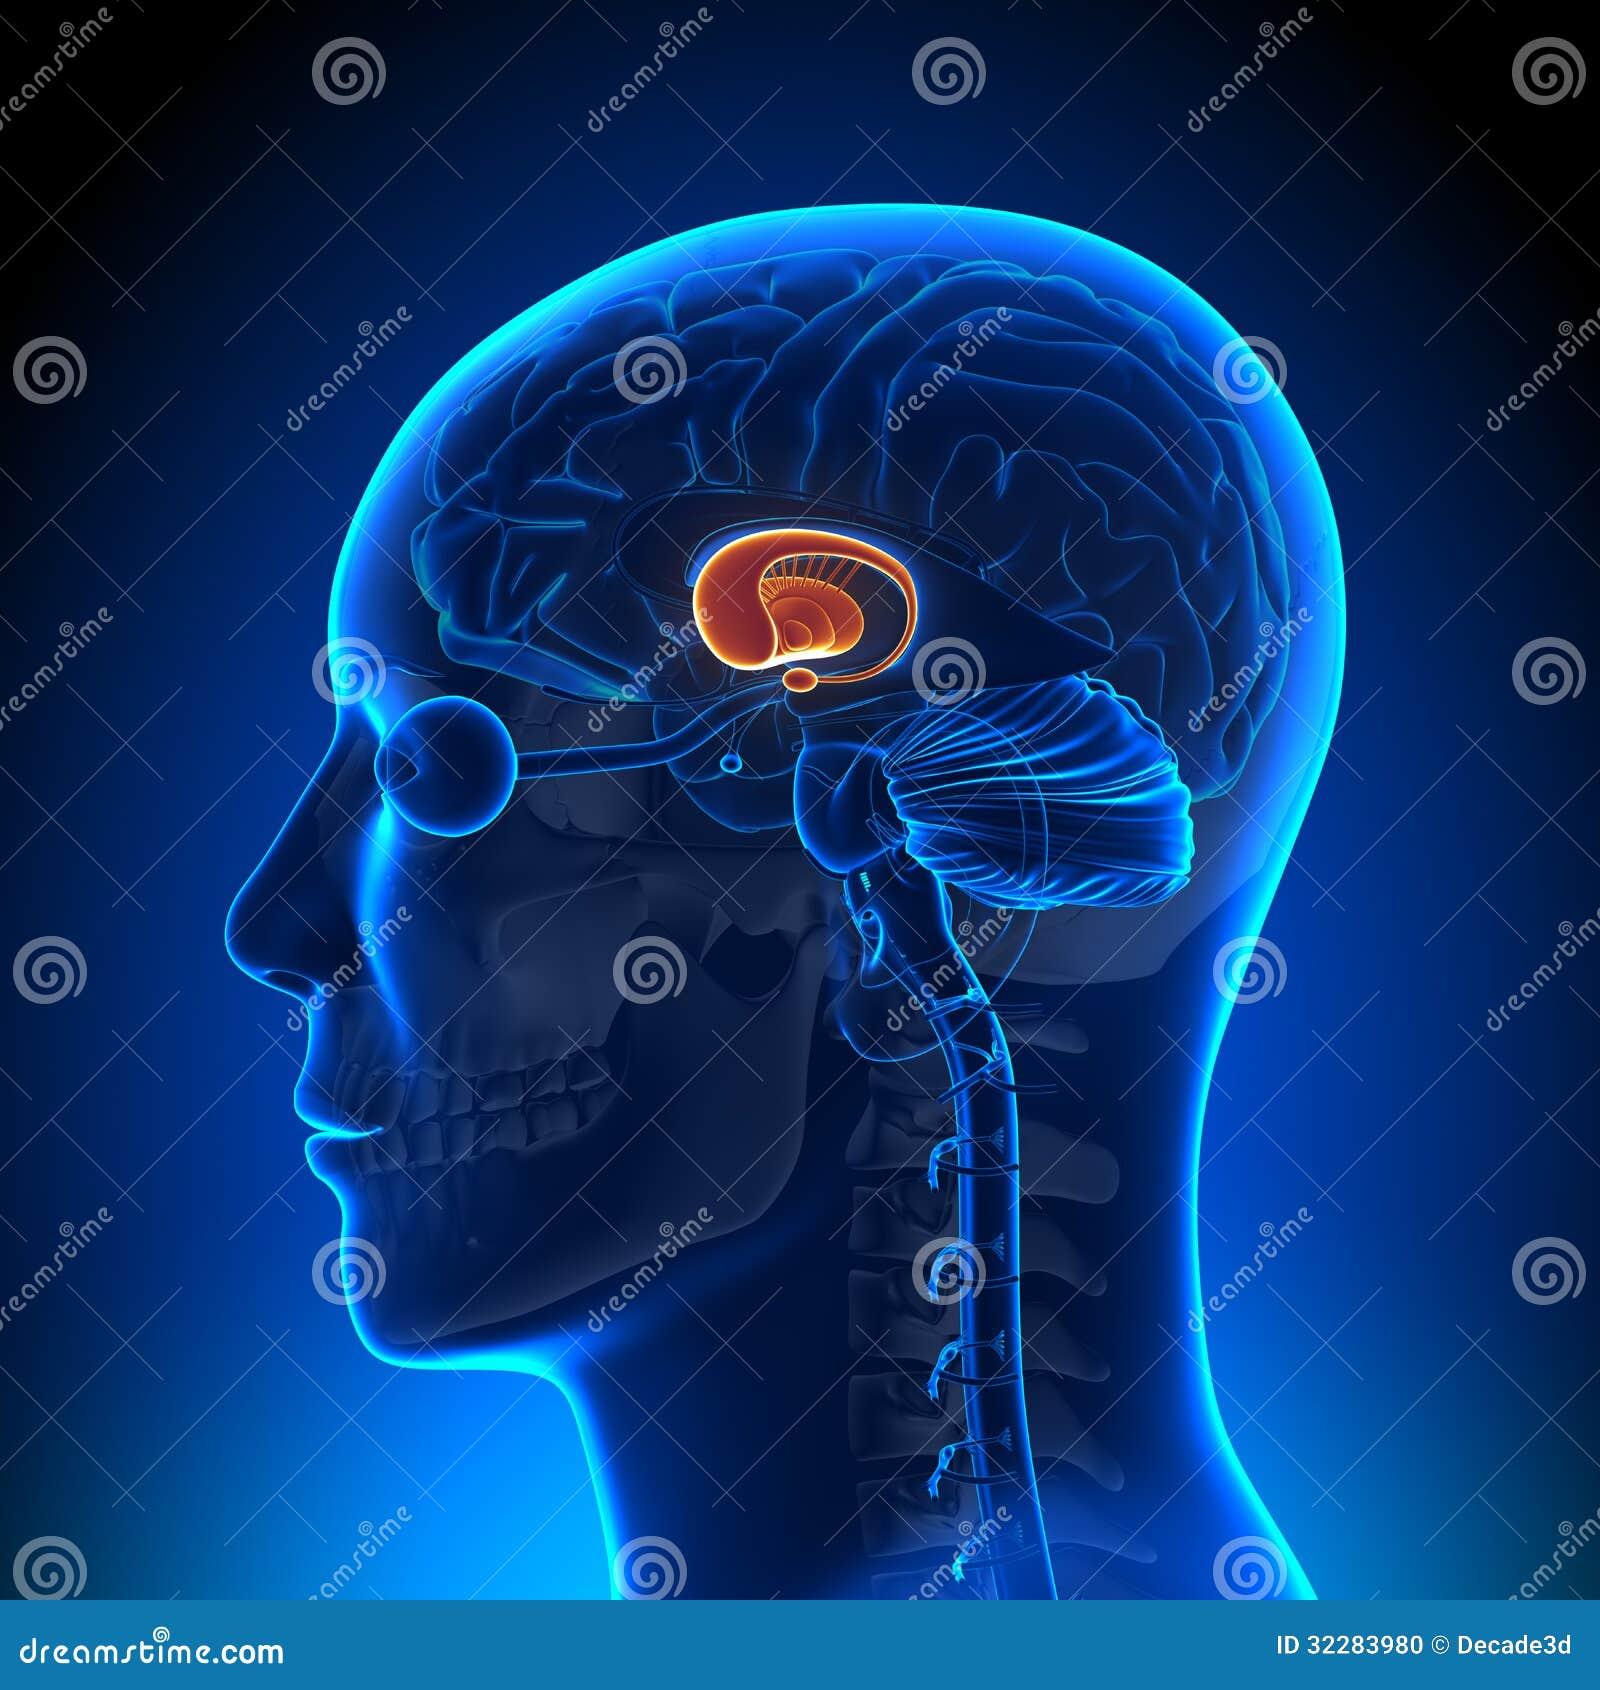 Brain Anatomy - Basal Ganglia Stock Illustration - Illustration of ...